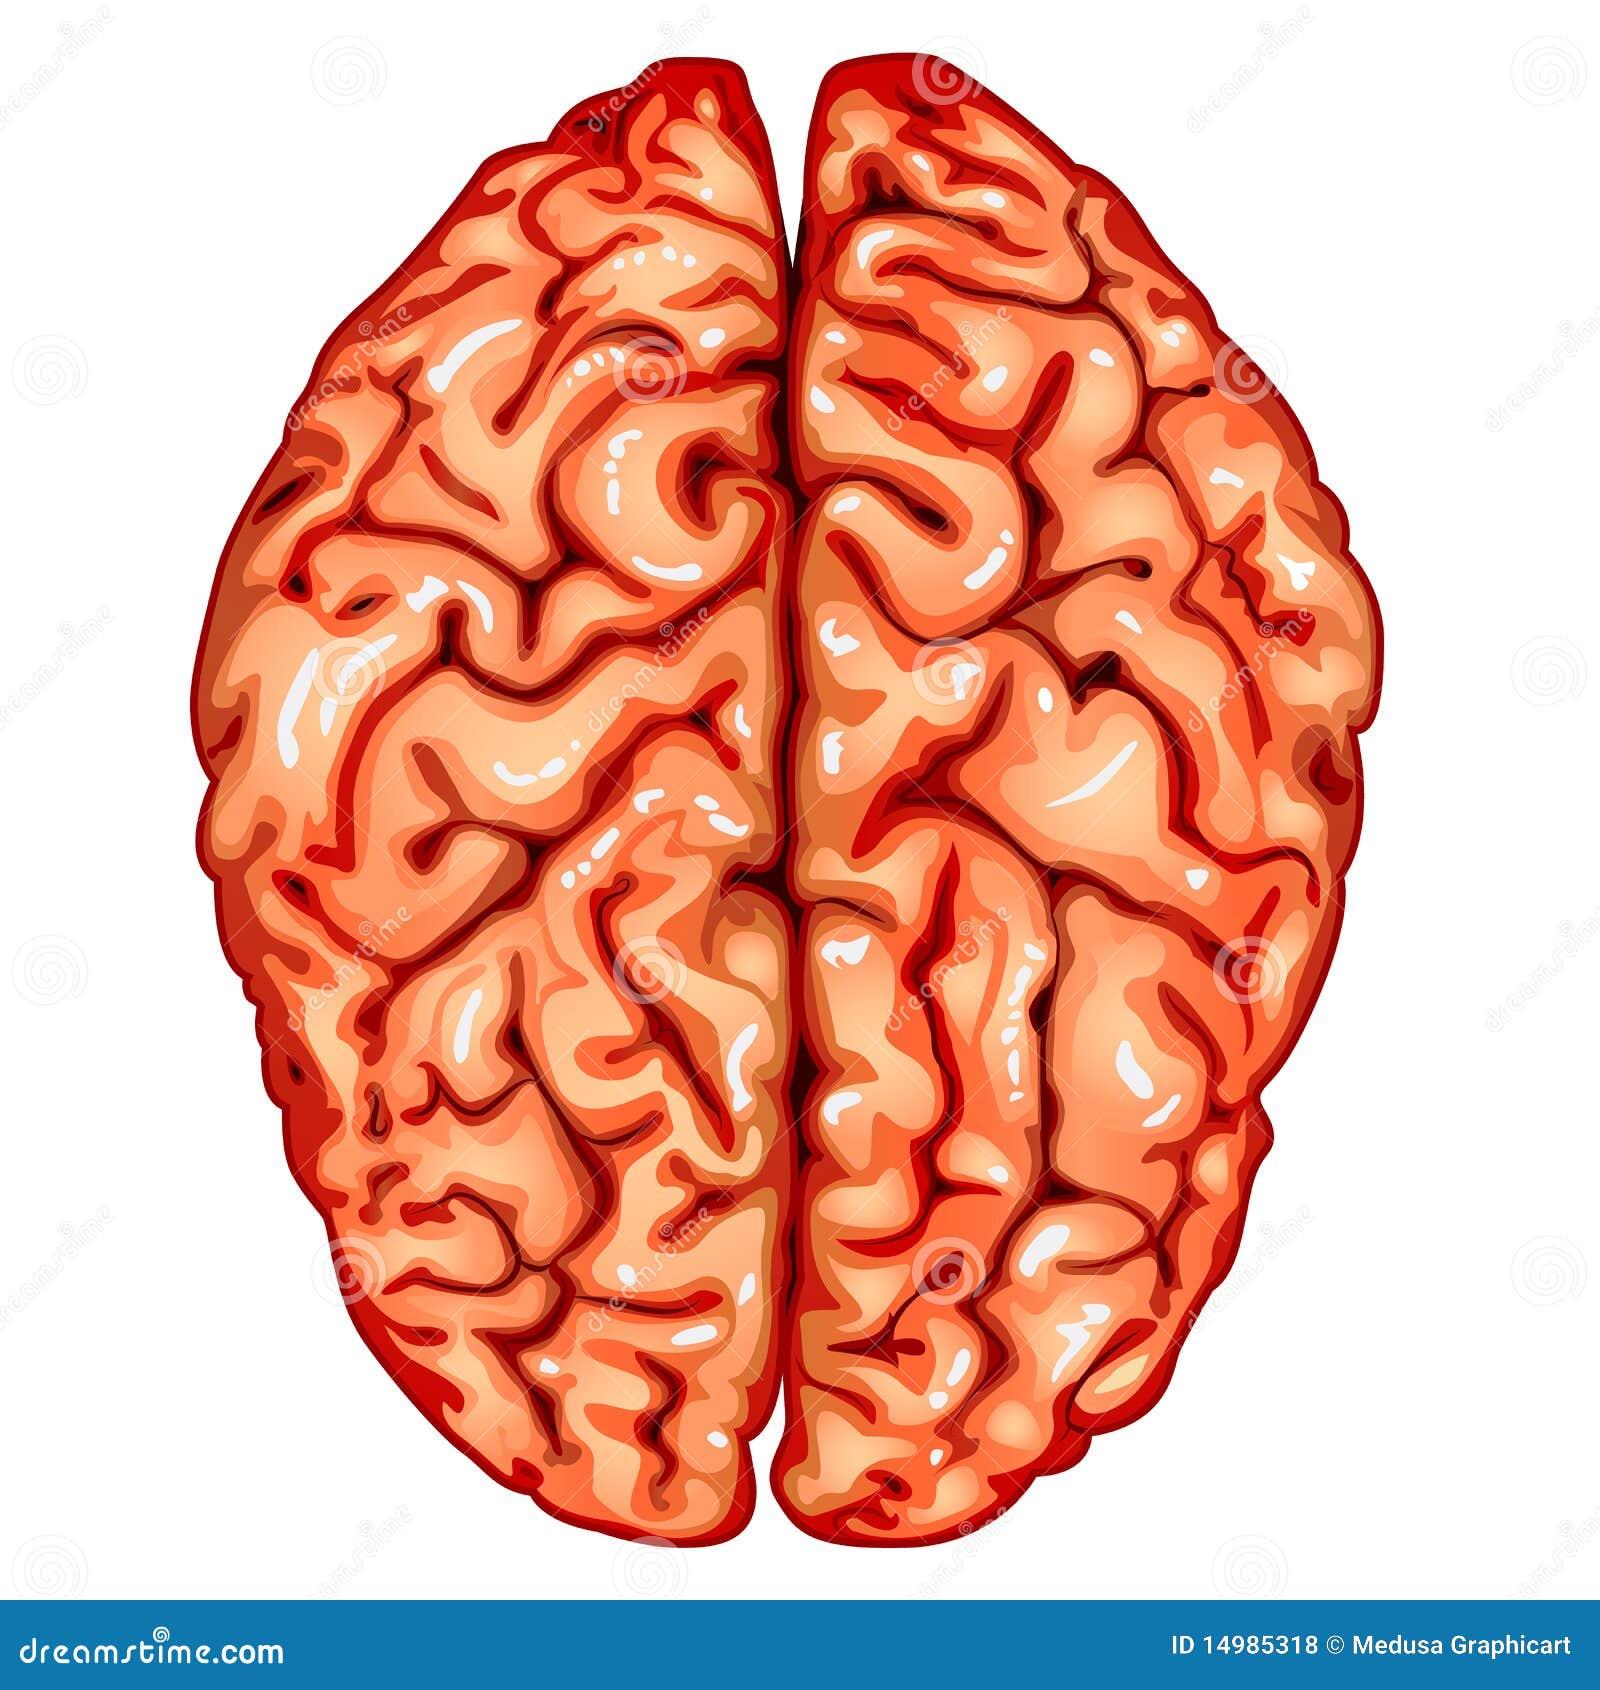 Фото мозг старого человека 7